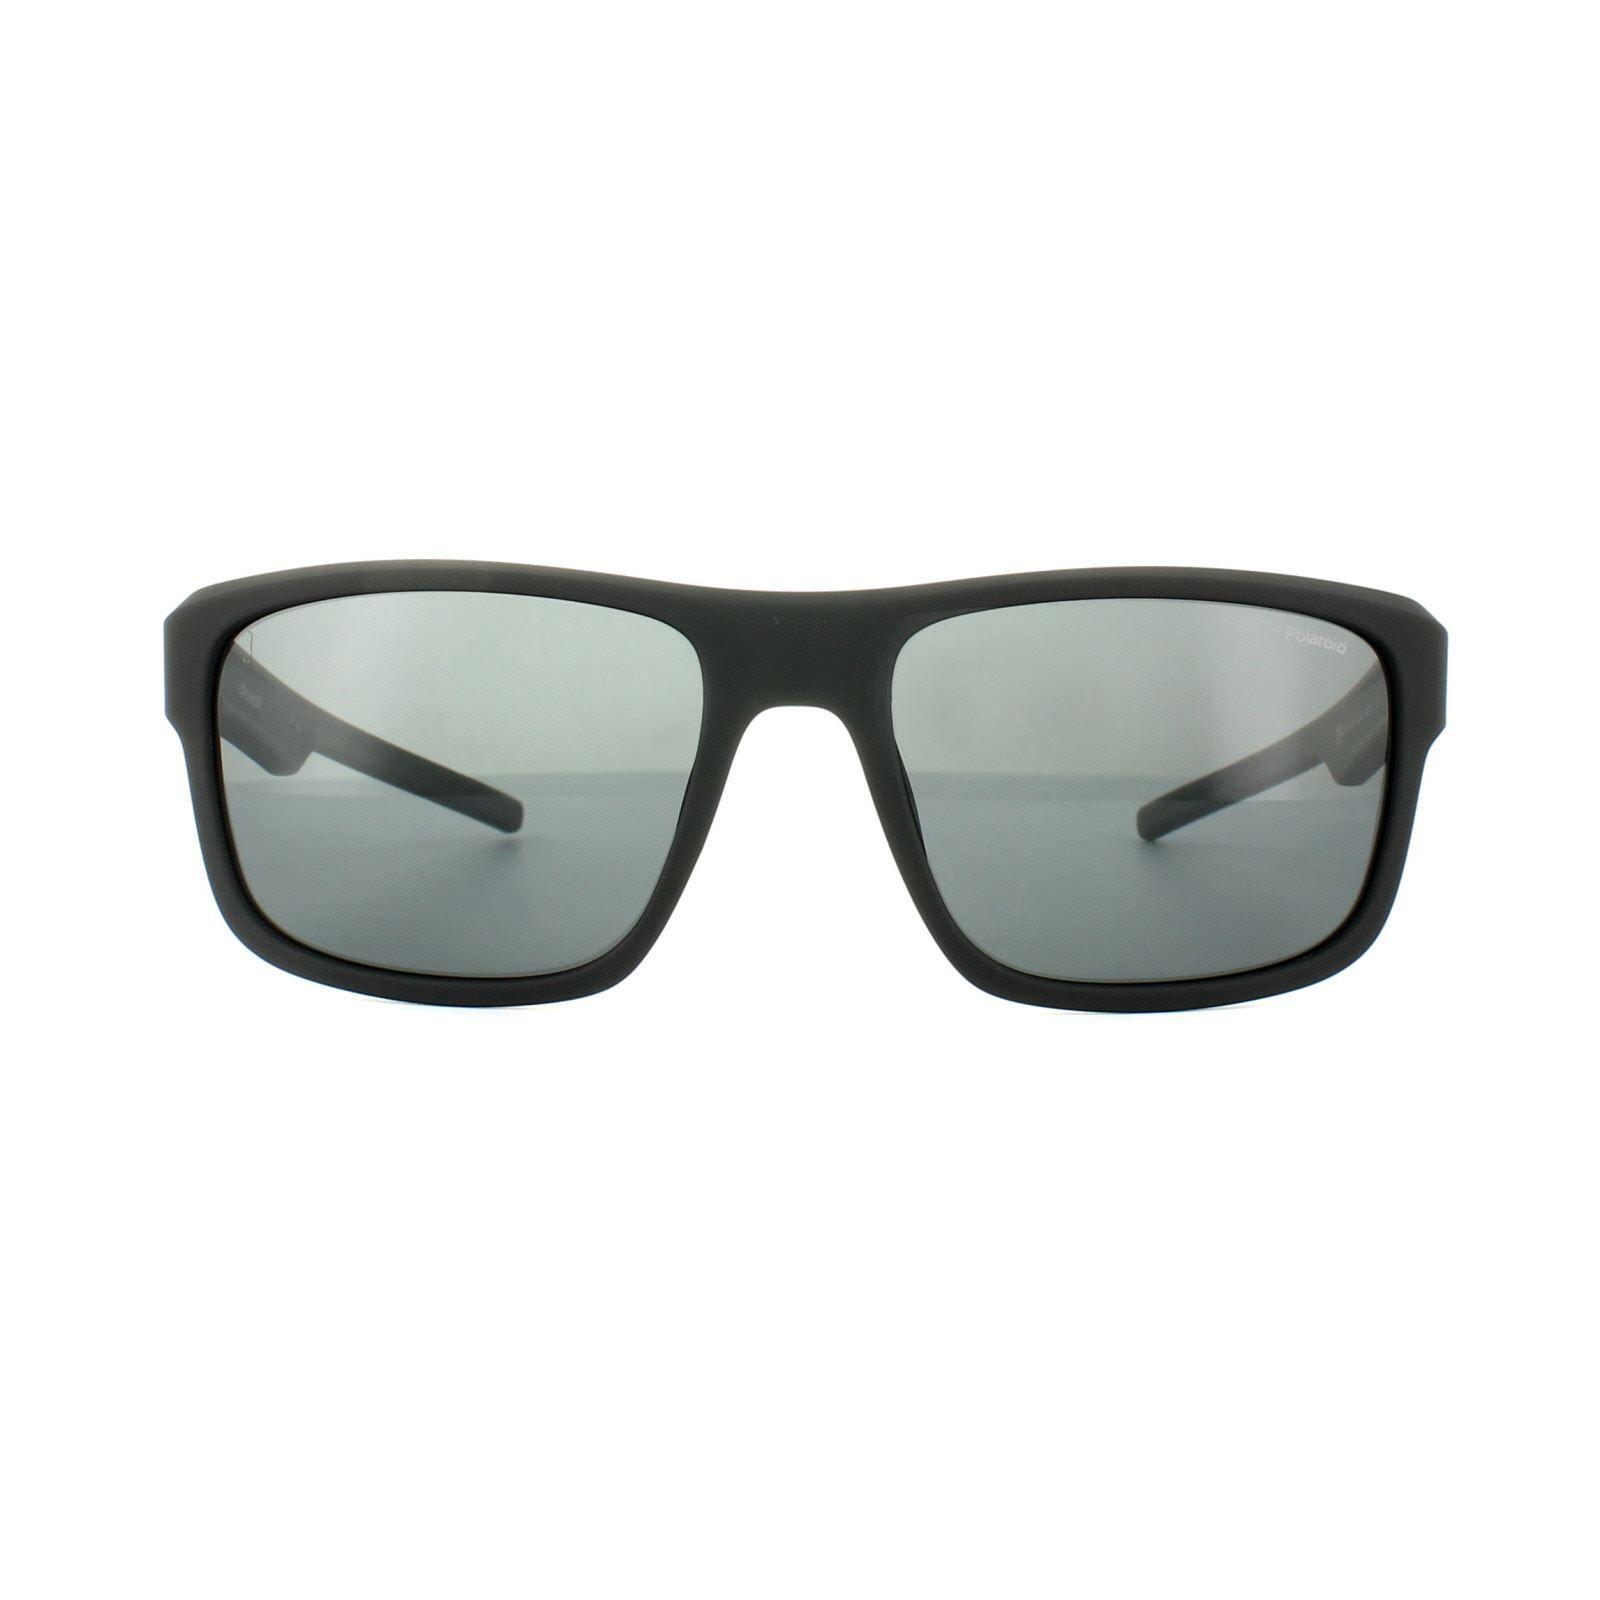 Polaroid Sunglasses PLD 3018/S DL5 Y2 Black Grey Polarized